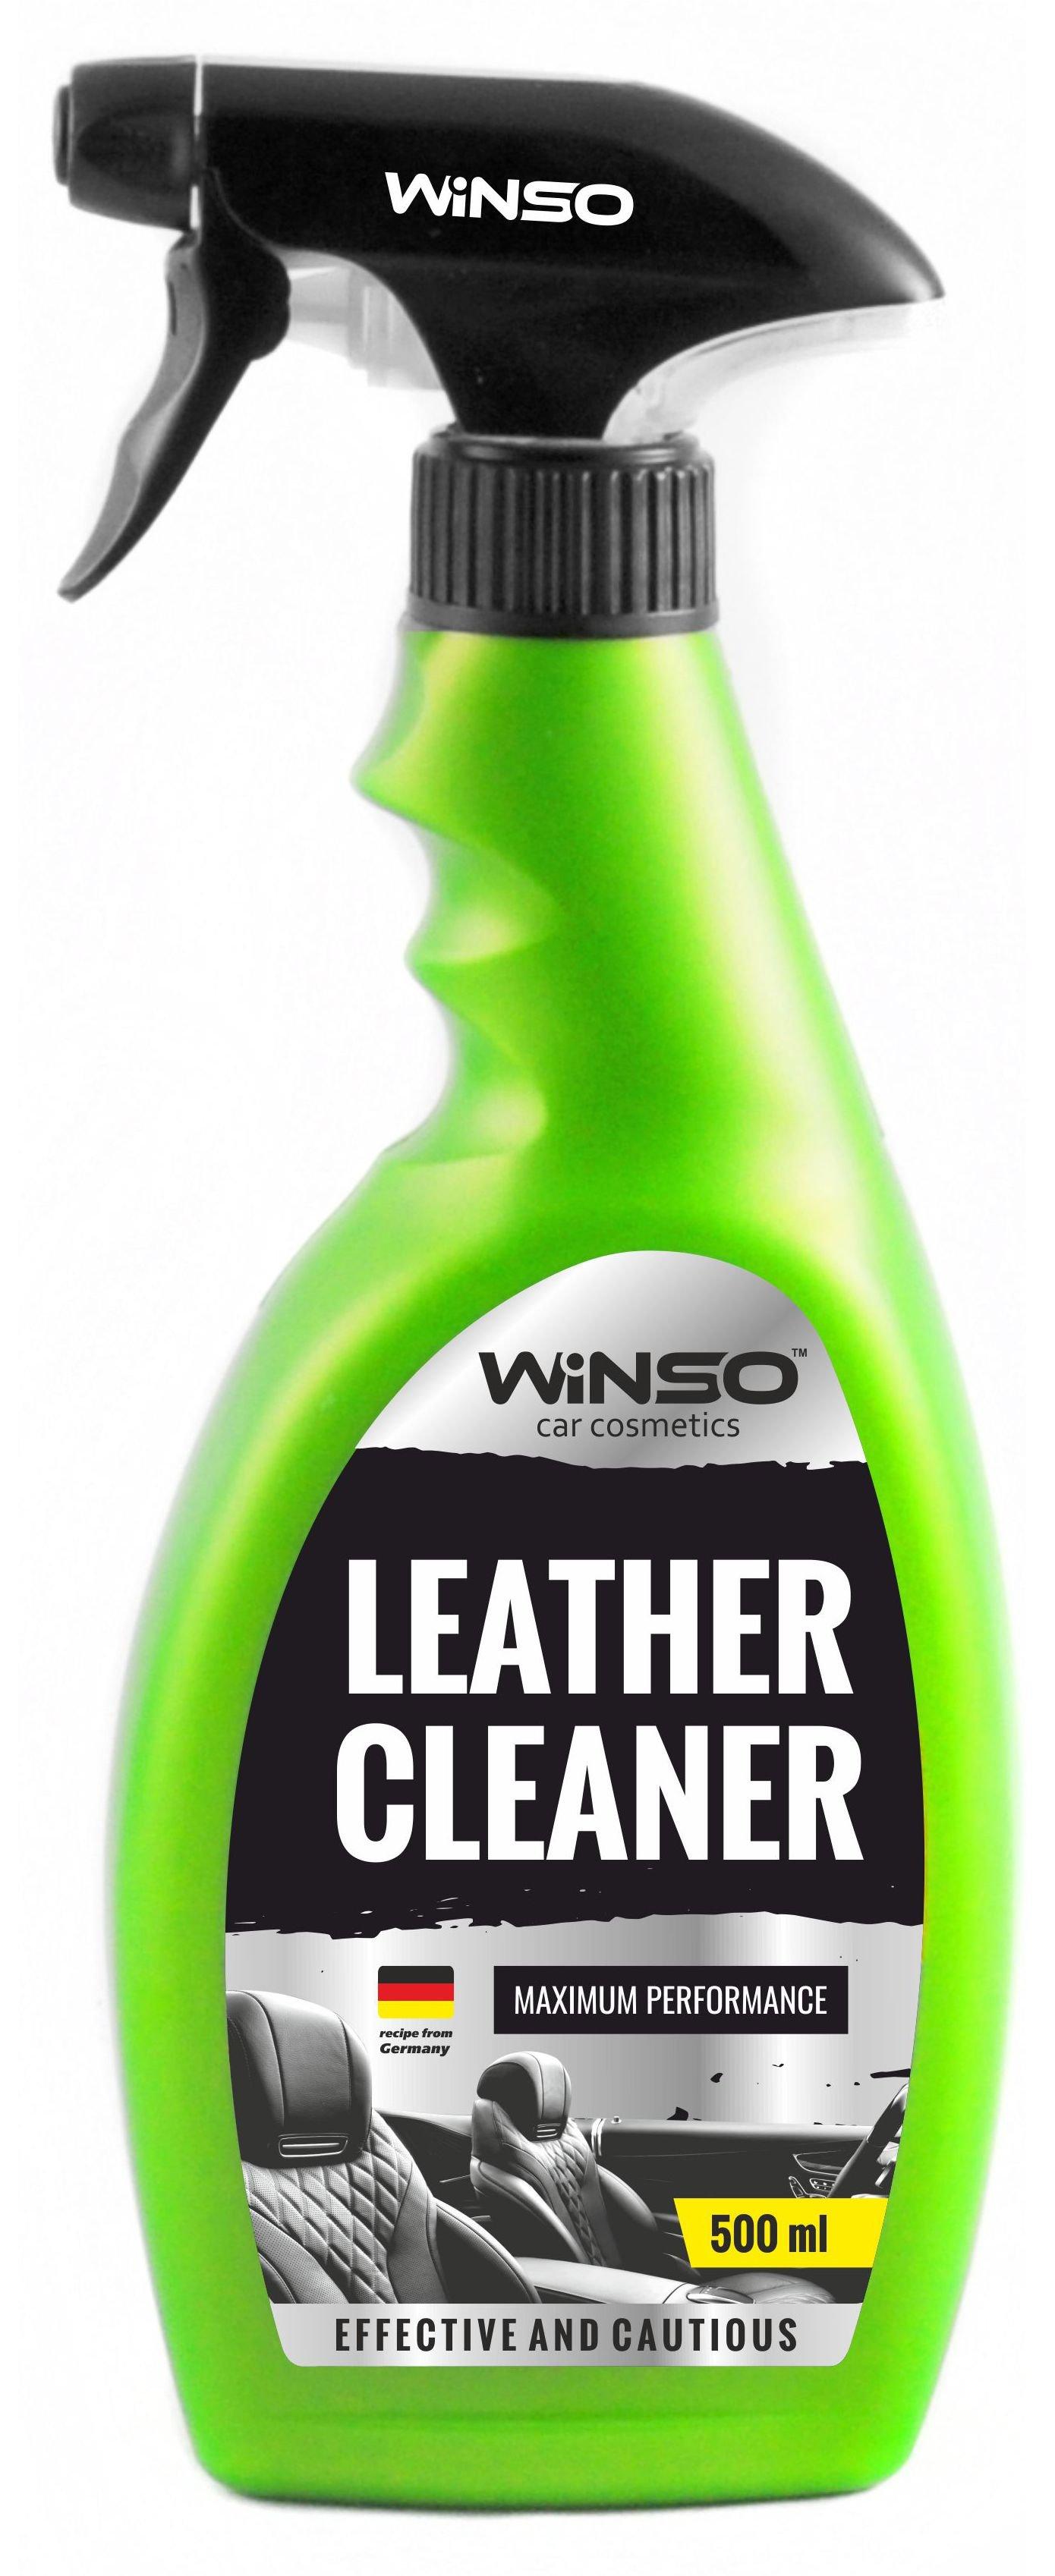 Очиститель кожи LEATHER CLEANER 500мл